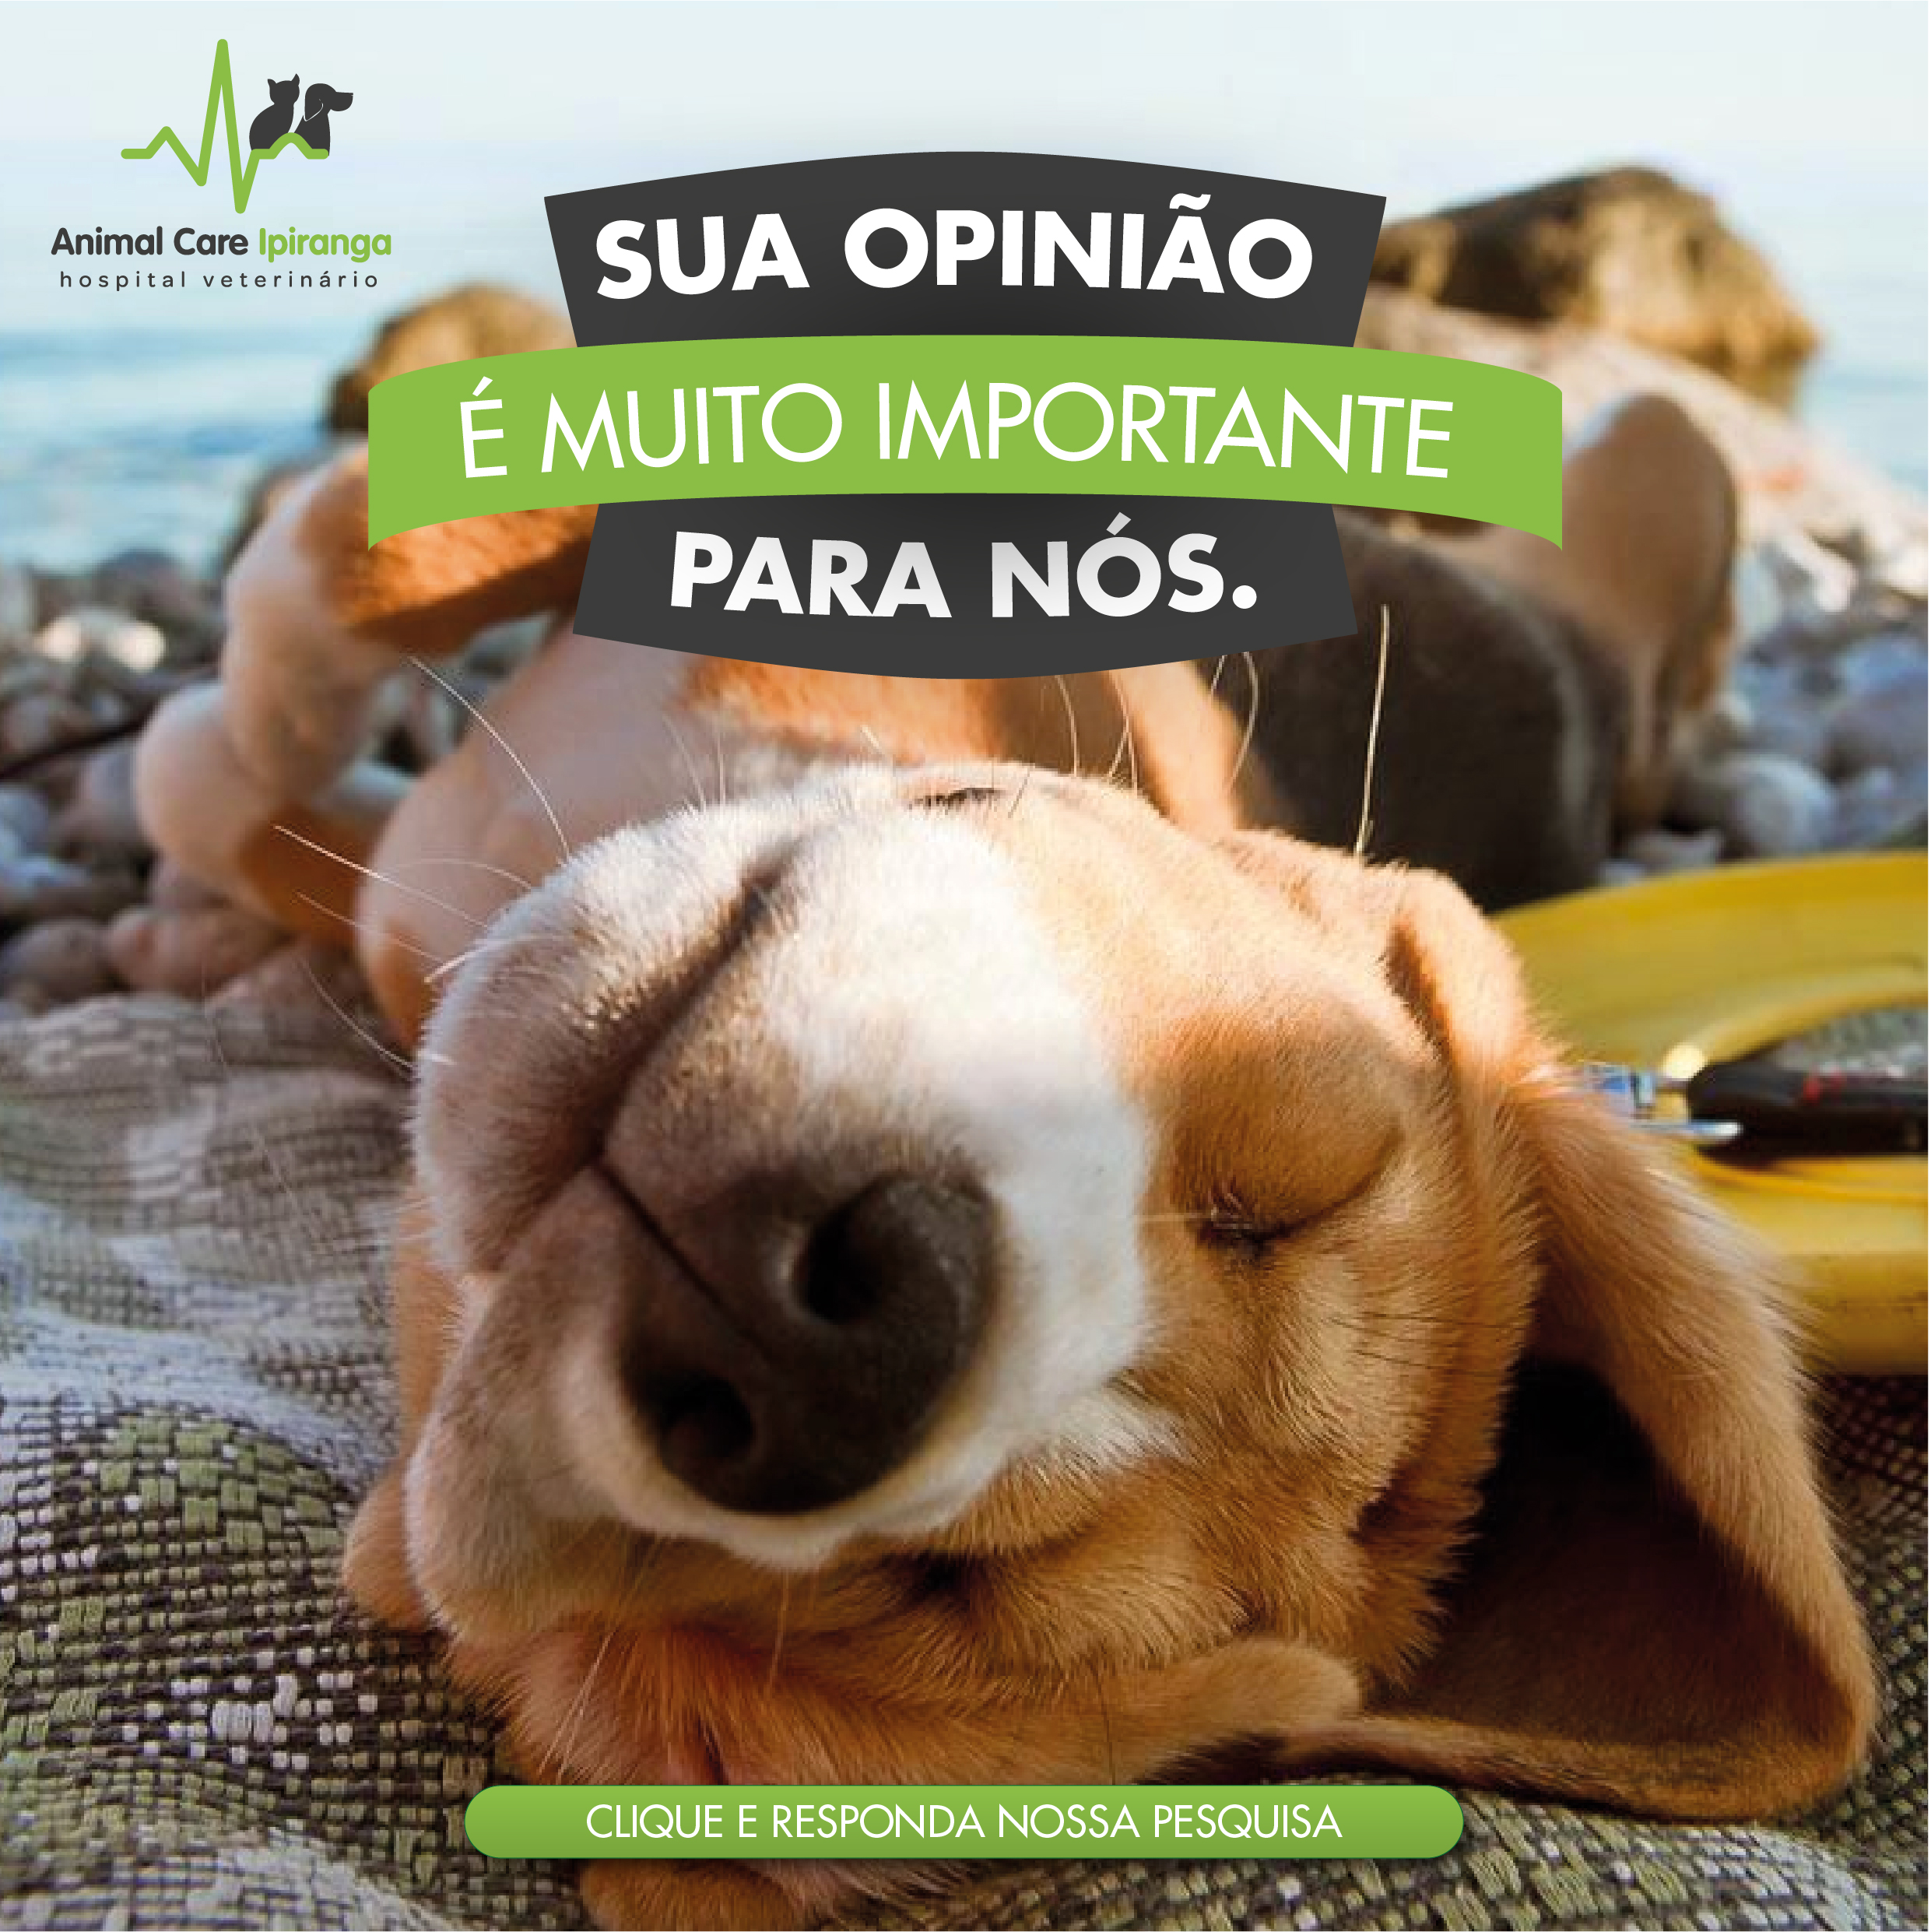 calltoaction_pesquisa_de_mercado_animal_care_ipiranga_ly01-01.jpg